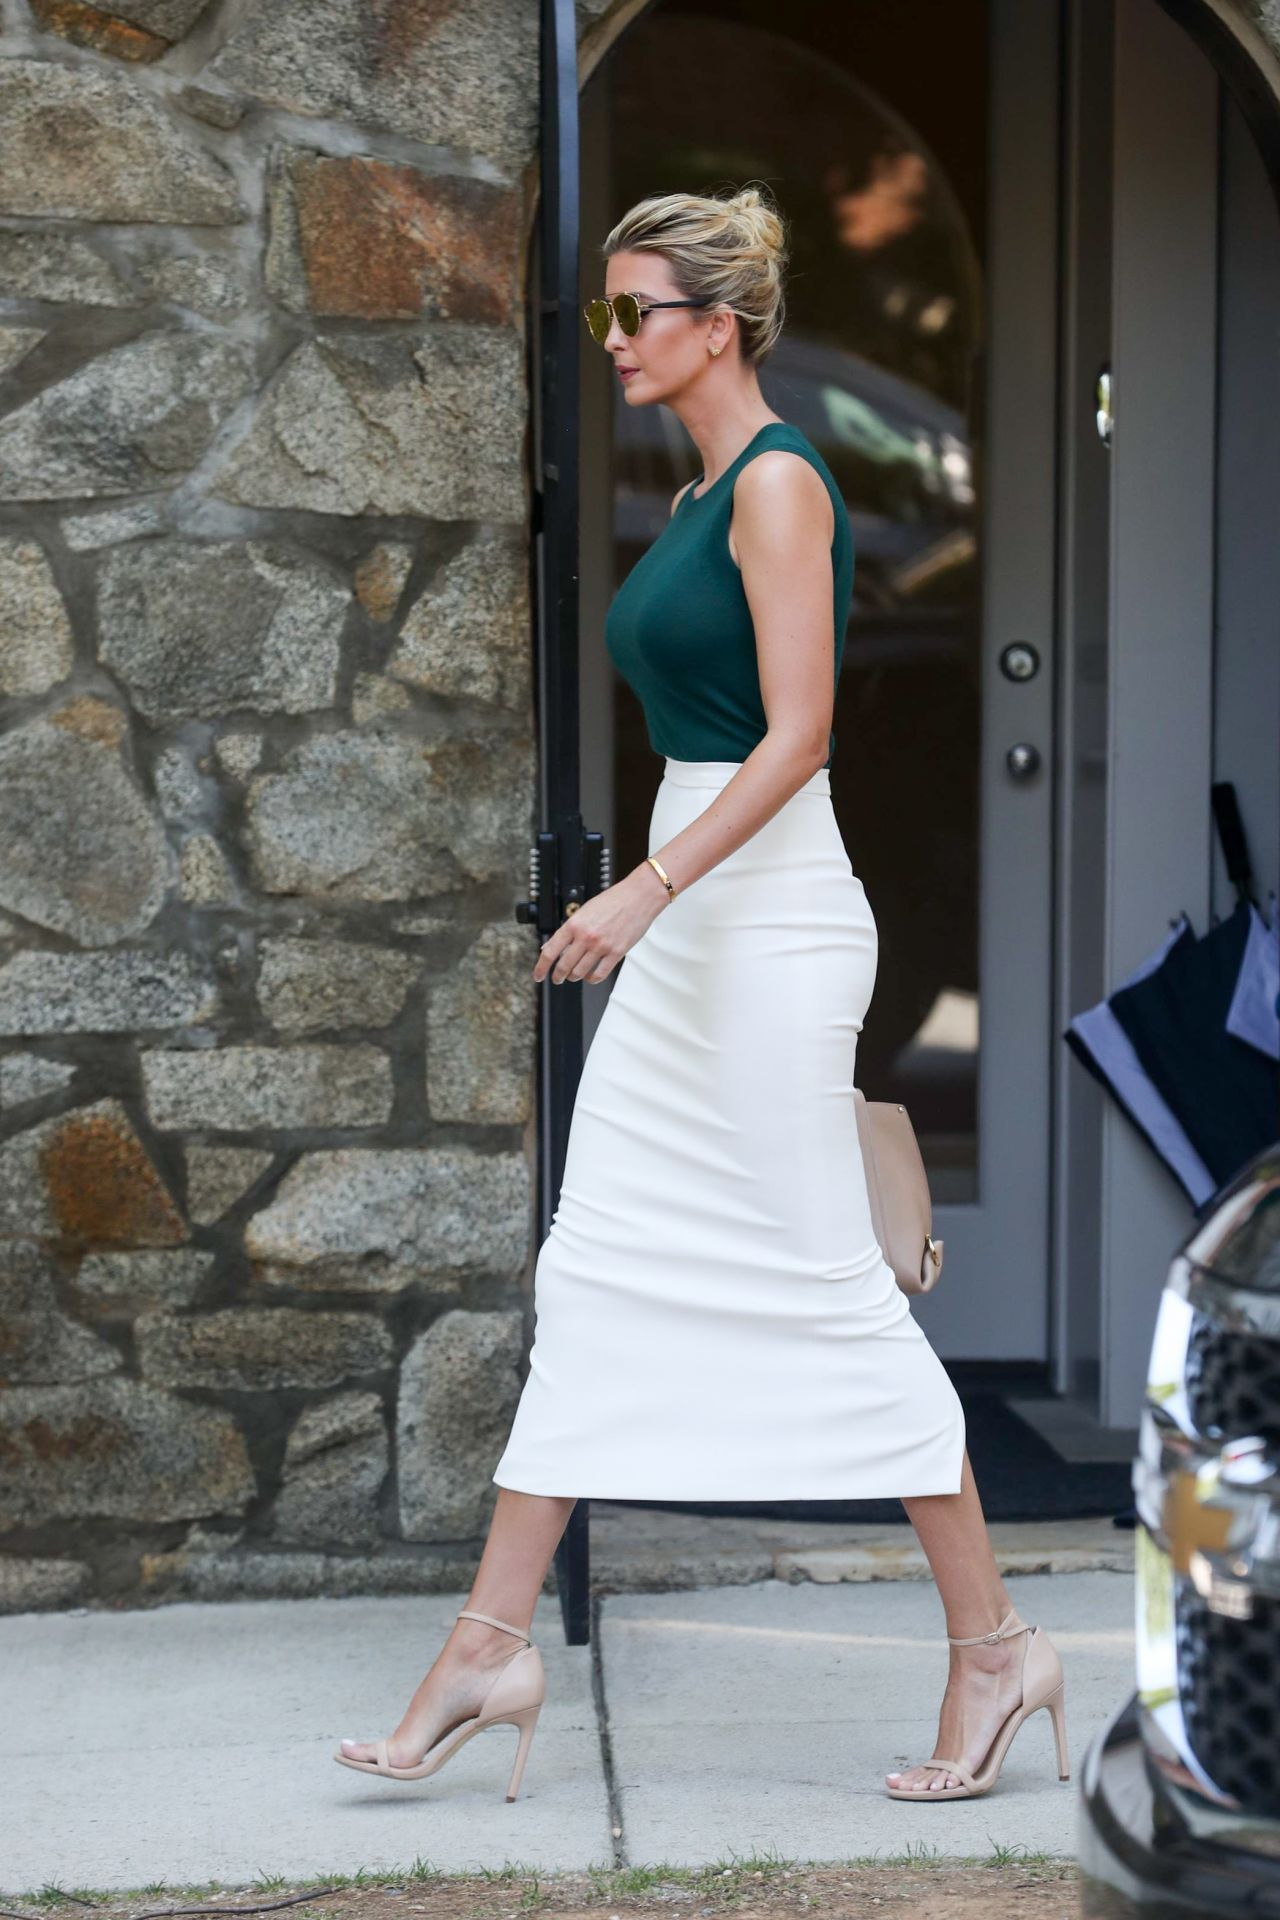 Ivanka Trump Heads To Work In Washington D C 08 01 2017